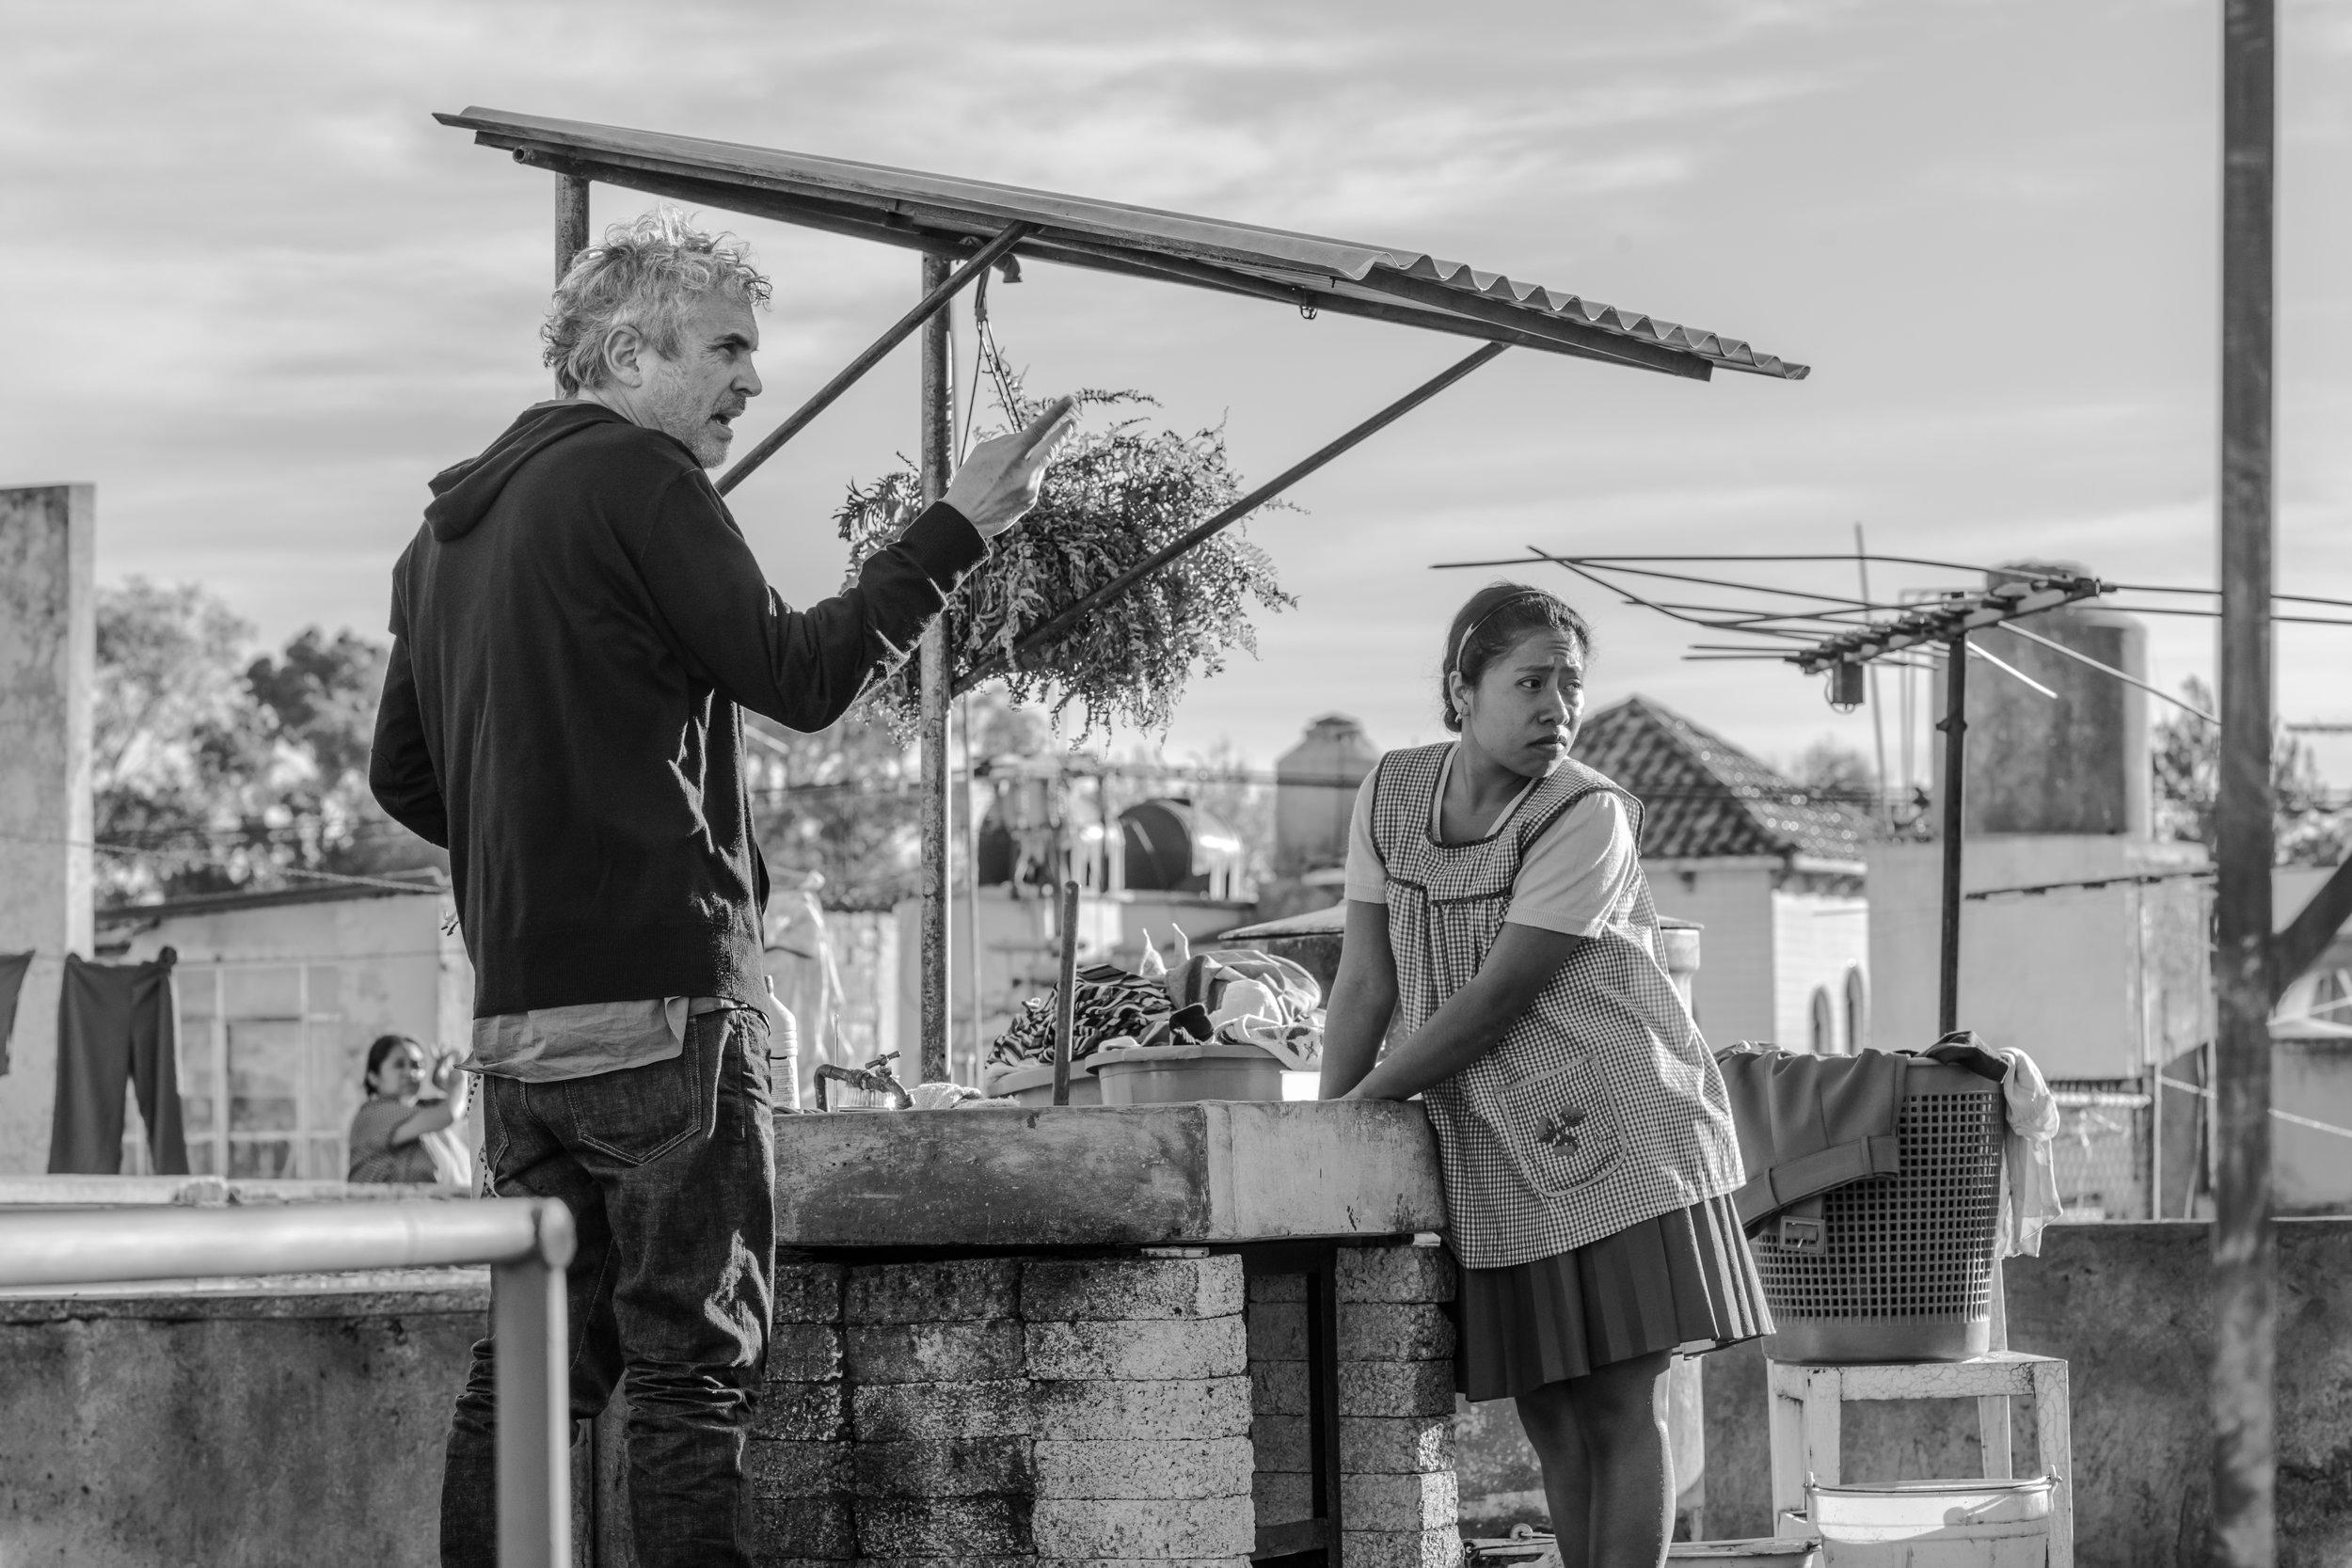 Alfonso Cuaron and Yalitza Aparicio on the set of Roma